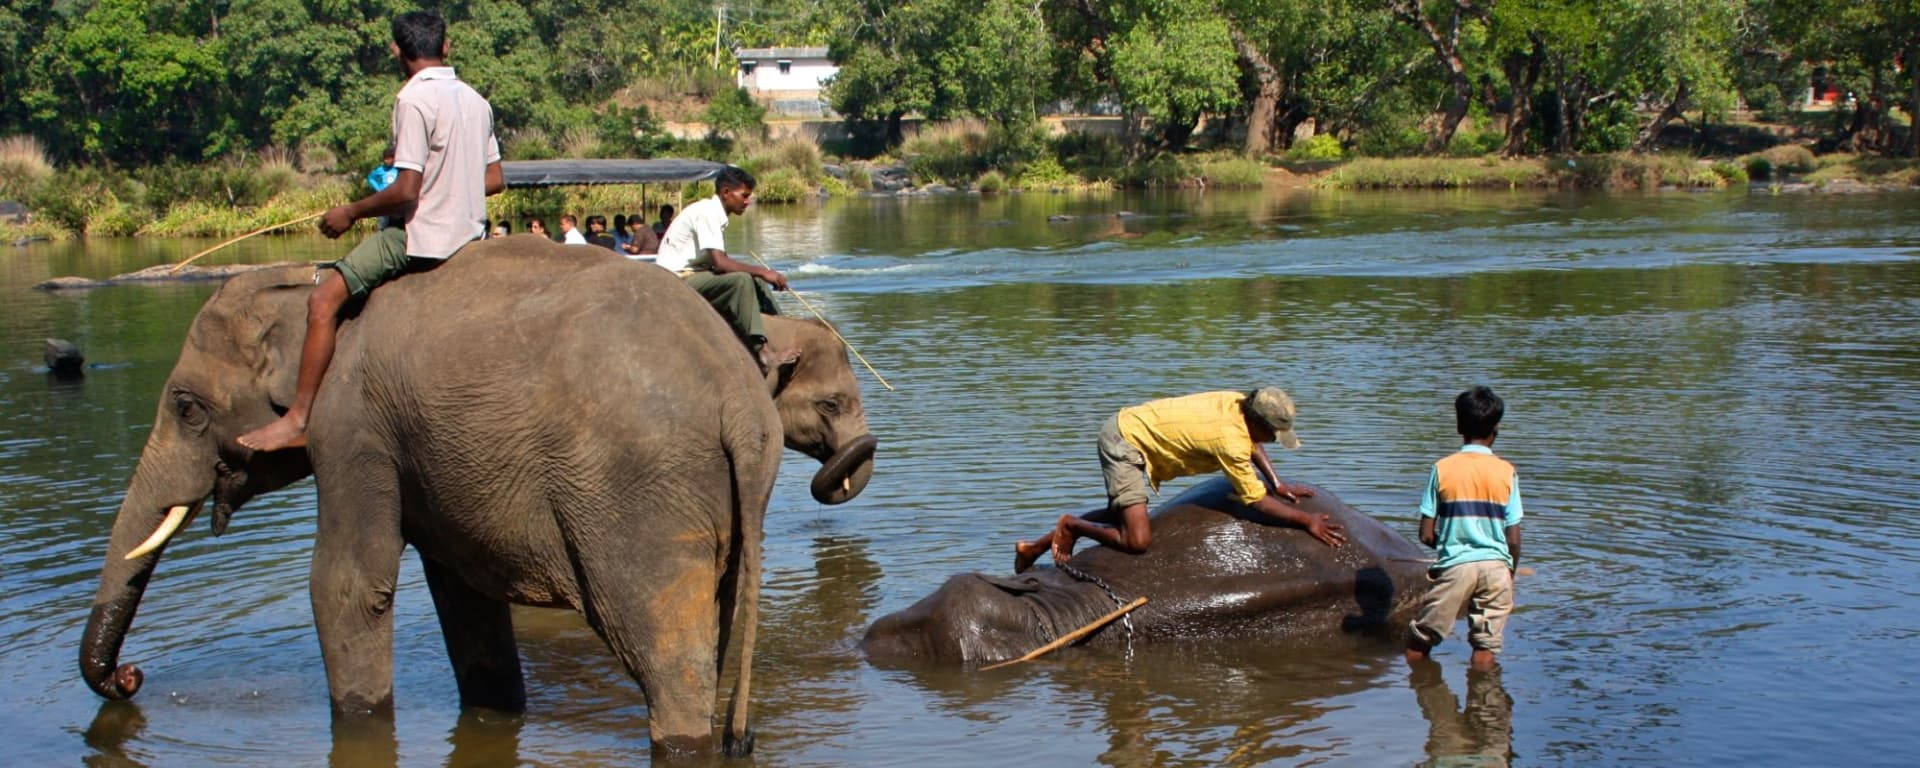 Le sud diversifié de l'Inde de Kochi: Dubare: Elephant Camp